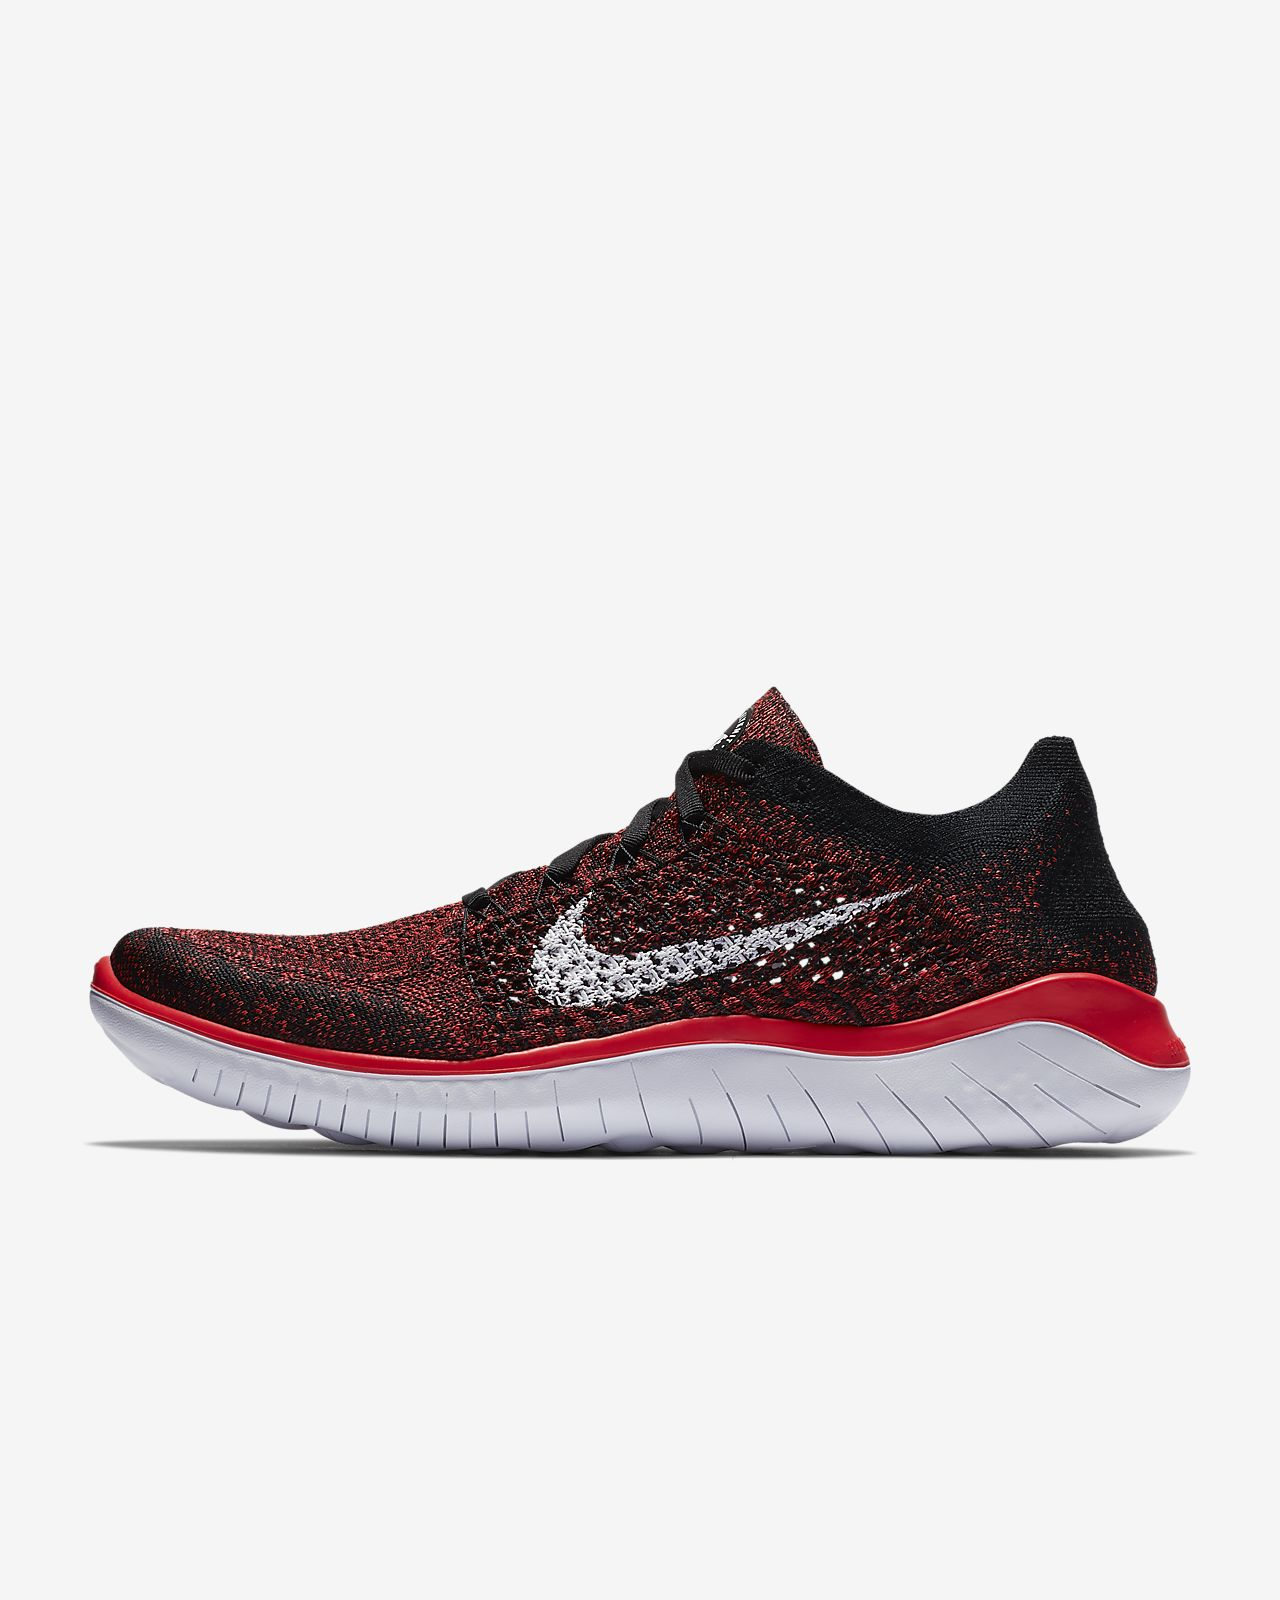 Nike Free RN 2018, Chaussures de Running Homme, Blanc (Blanc/Noir 100), 45.5 EU